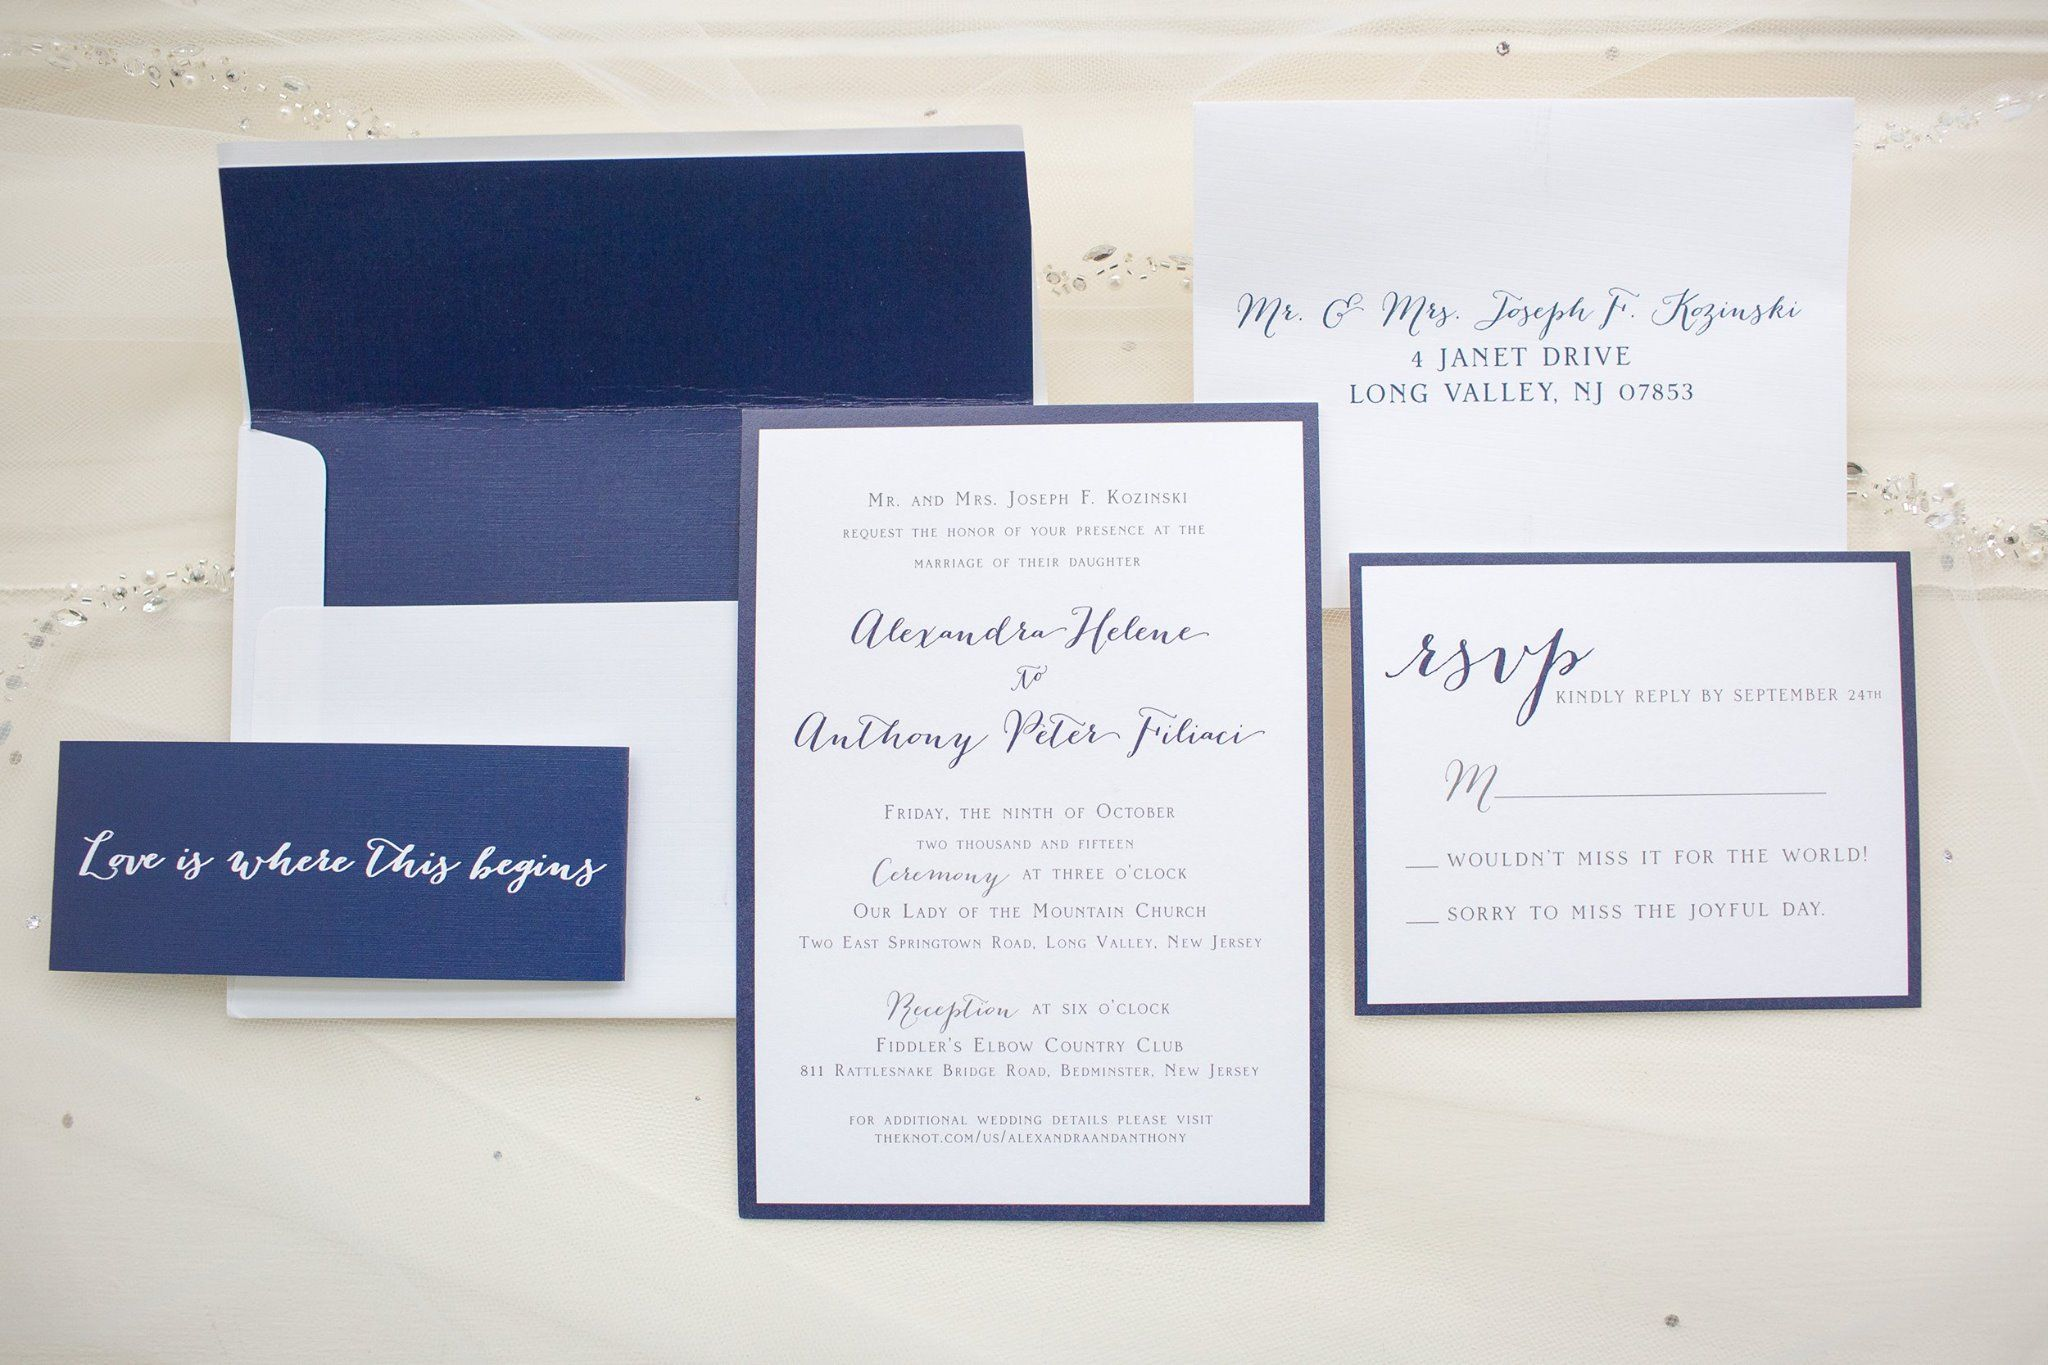 Classic navy blue and white invitation design belly band with song classic navy blue and white invitation design belly band with song lyric custom envelope liner stopboris Images